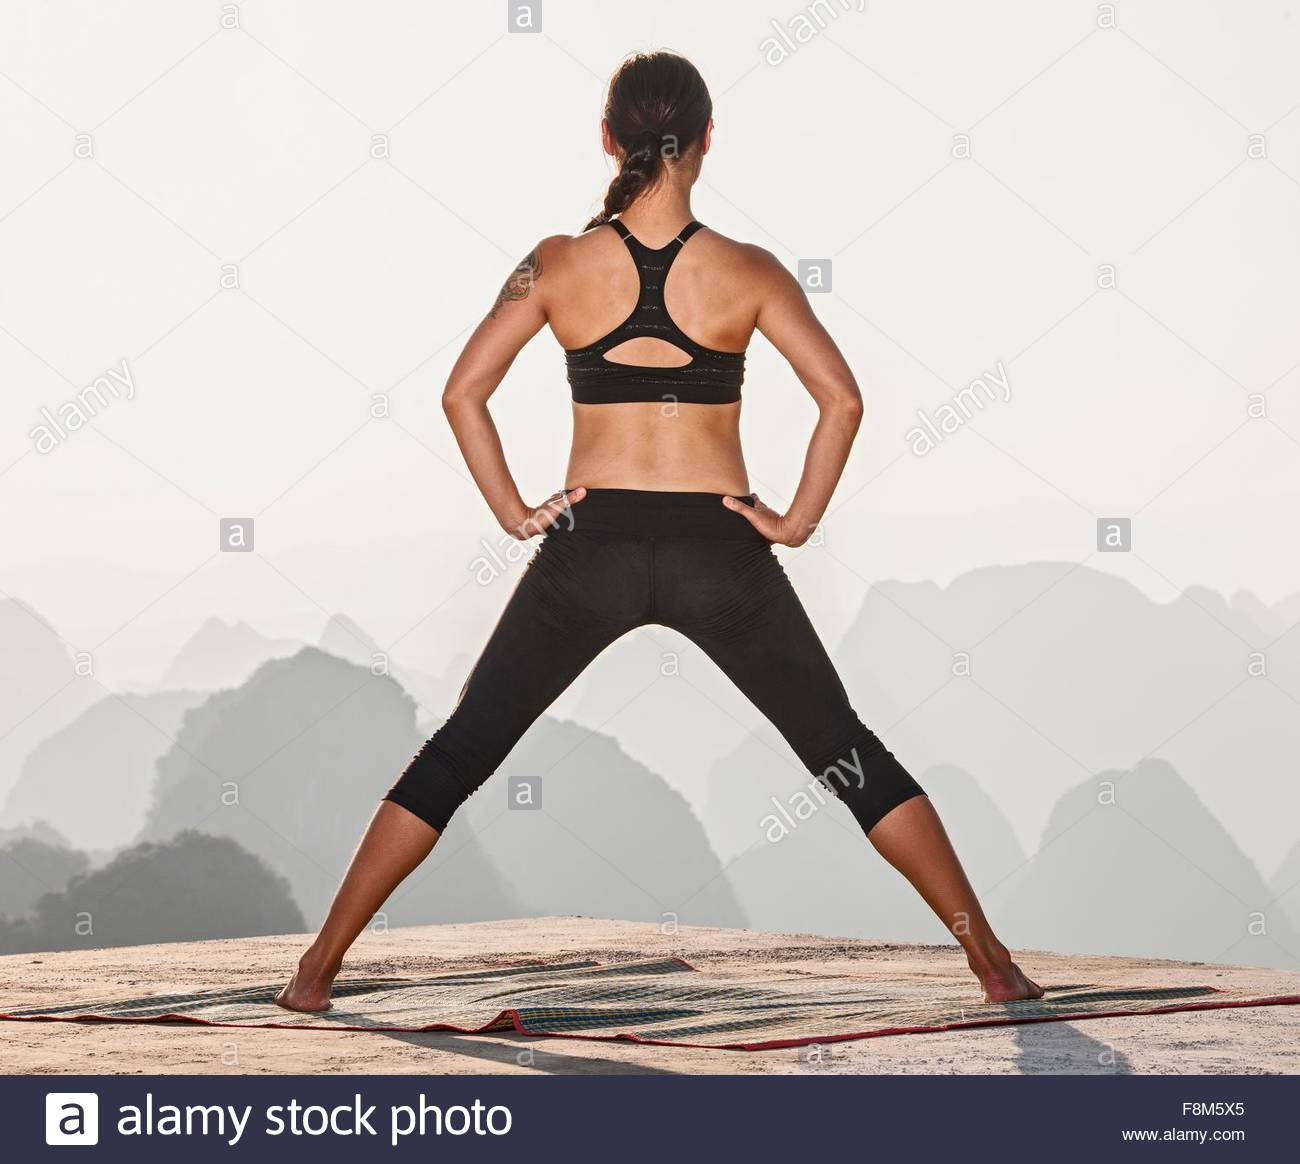 Rear view of woman in yoga pose above limestone mountains, Yangshuo, Guangxi Zhuang, China - Stock Image